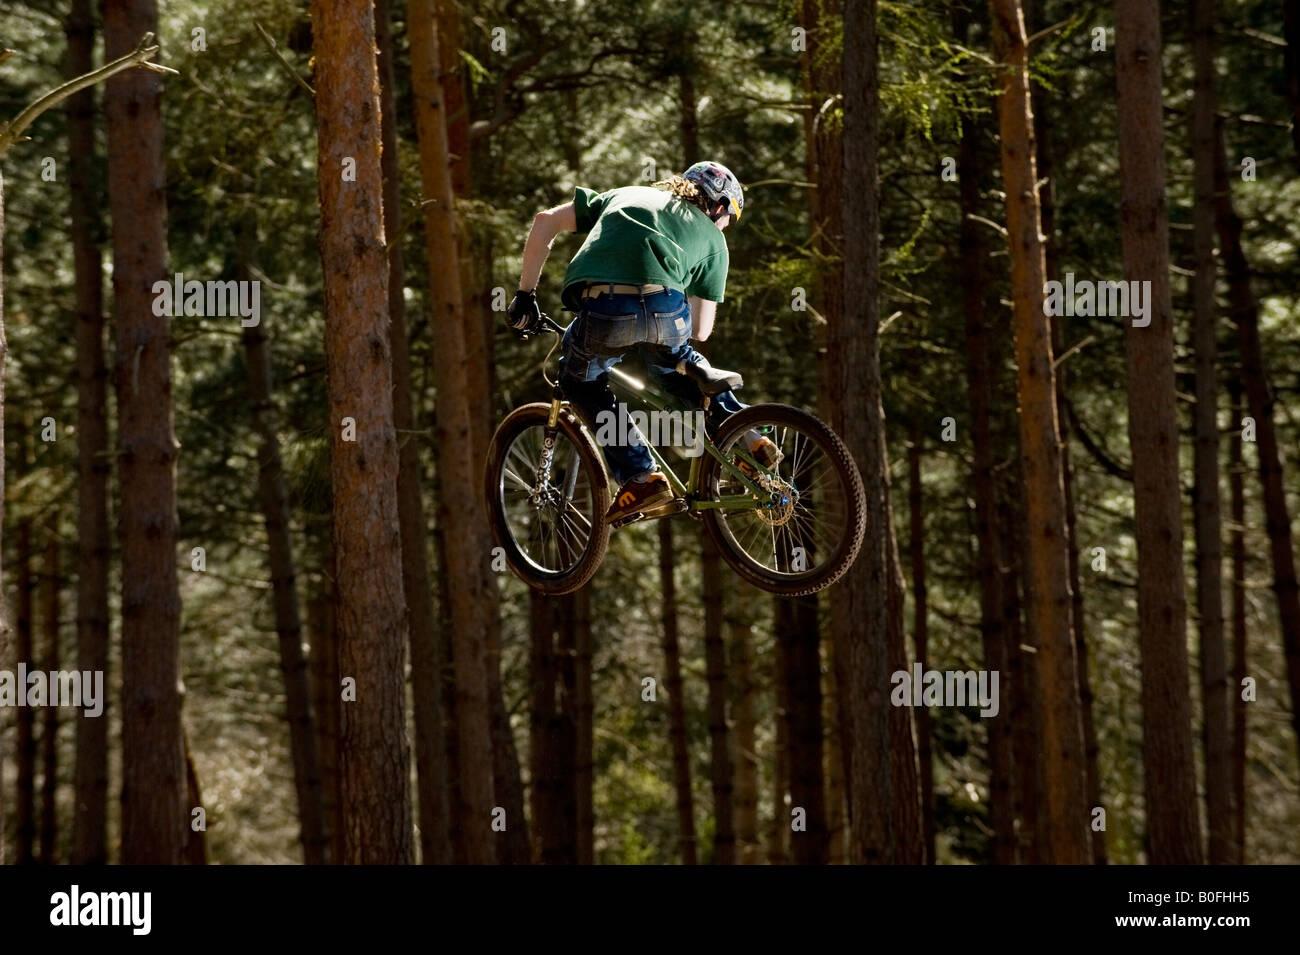 Dirt Bike Ramp >> mountain bike dirt jump trick stunt air leap bmx mountain bikes MTB Stock Photo: 17553457 - Alamy